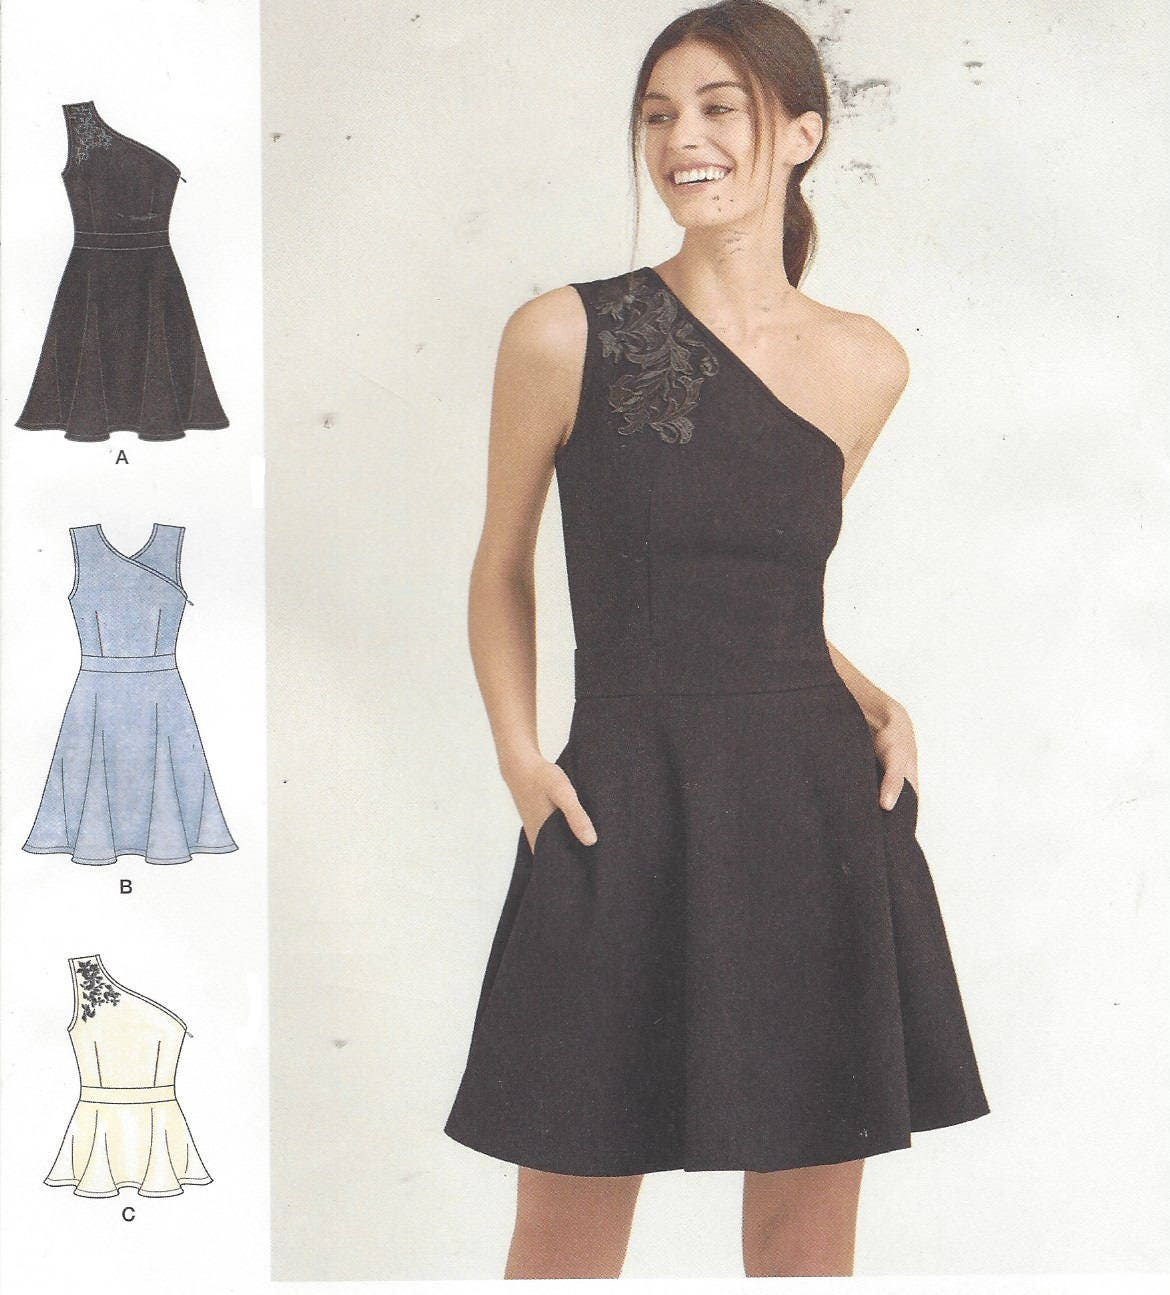 Cynthia Rowley Sewing Patterns: Cynthia Rowley Womens One Shoulder Knit Dress Or Top